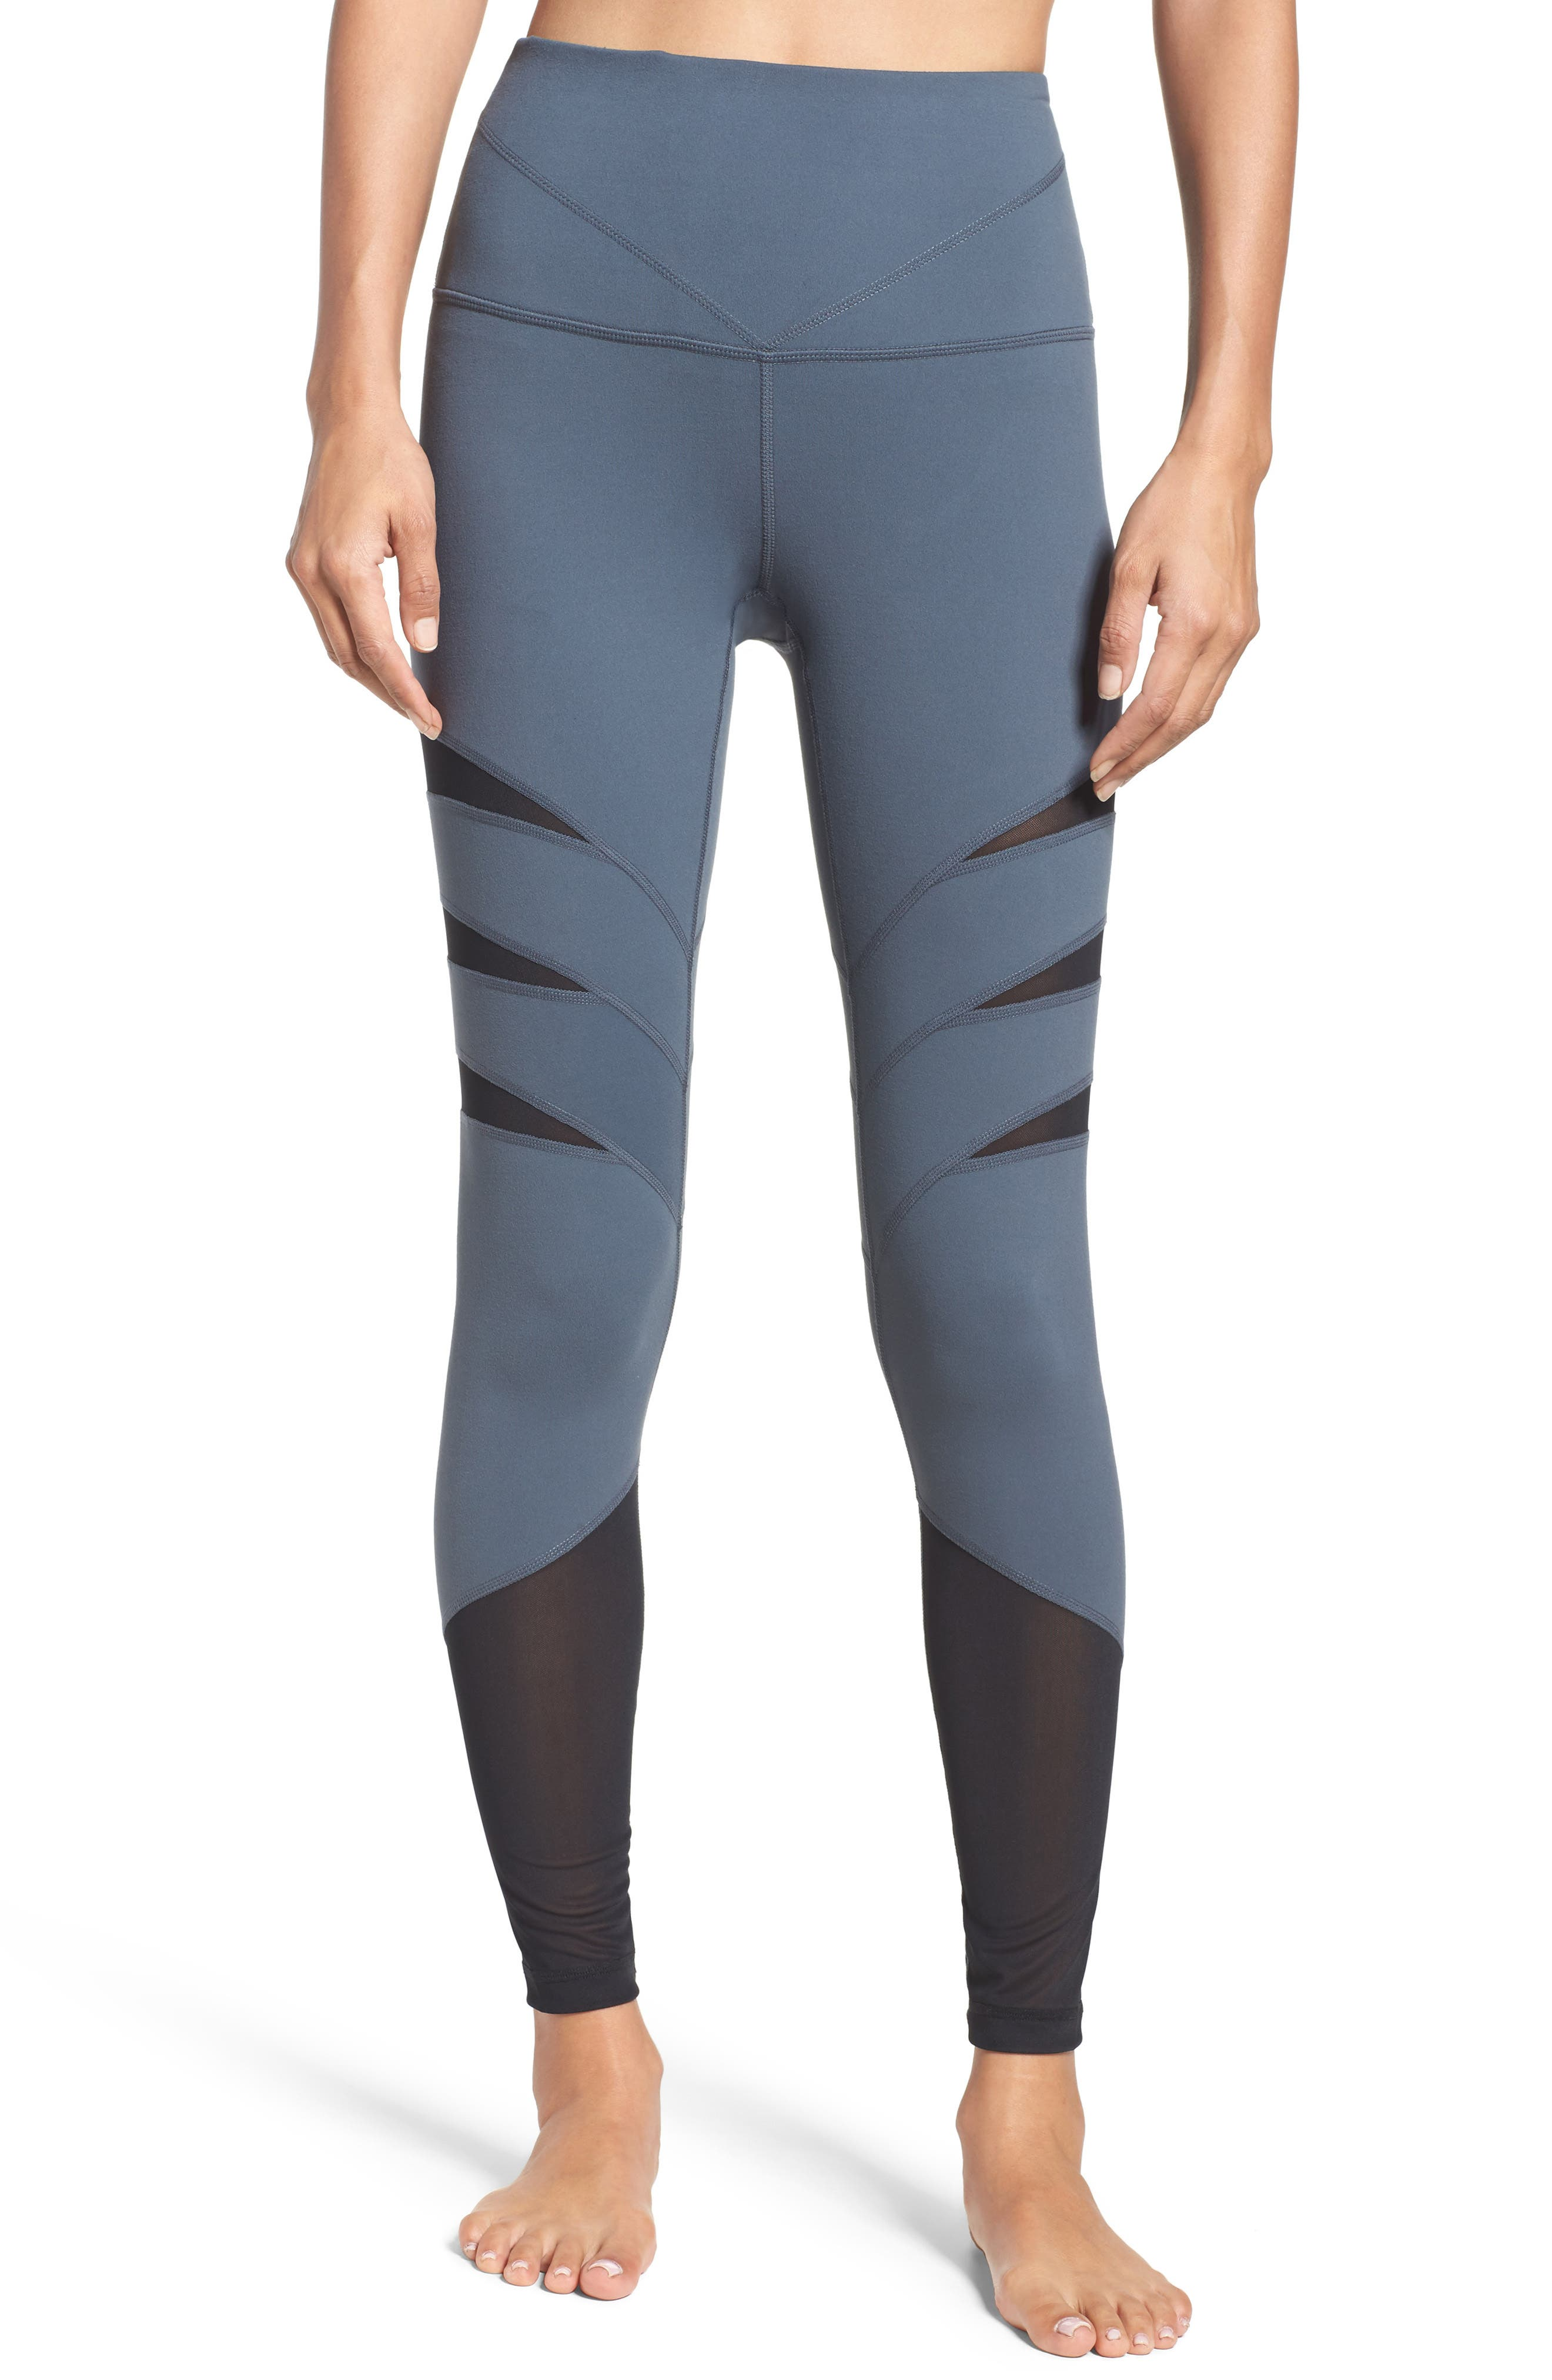 Flash High Waist Leggings,                         Main,                         color, Grey Graphite